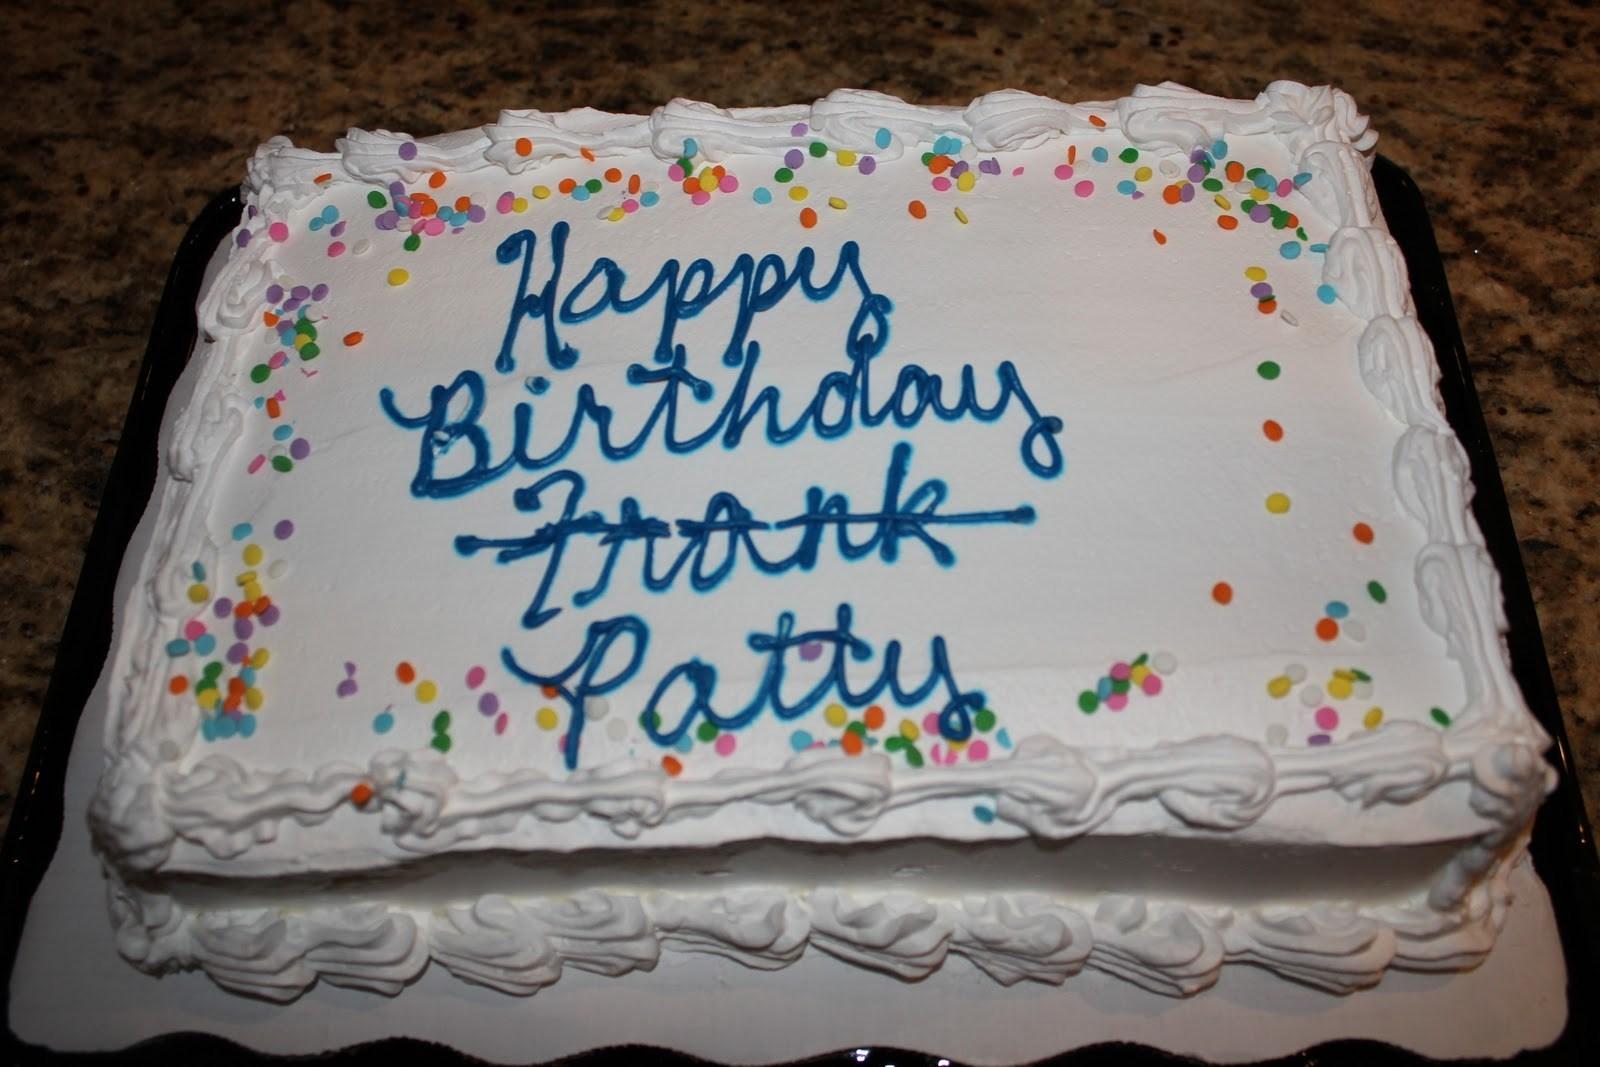 24 Spectacular Birthday Cake Fails Food Network Canada